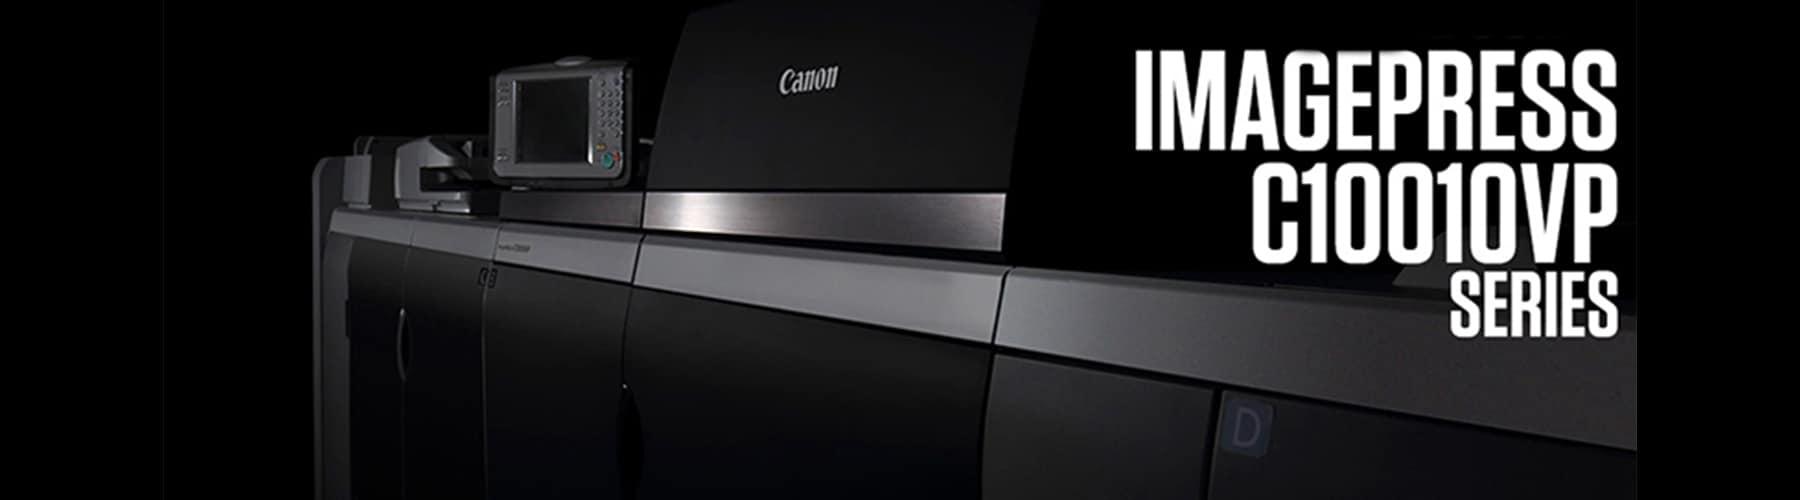 Il Production Printing si chiama imagePRESS C10010VP